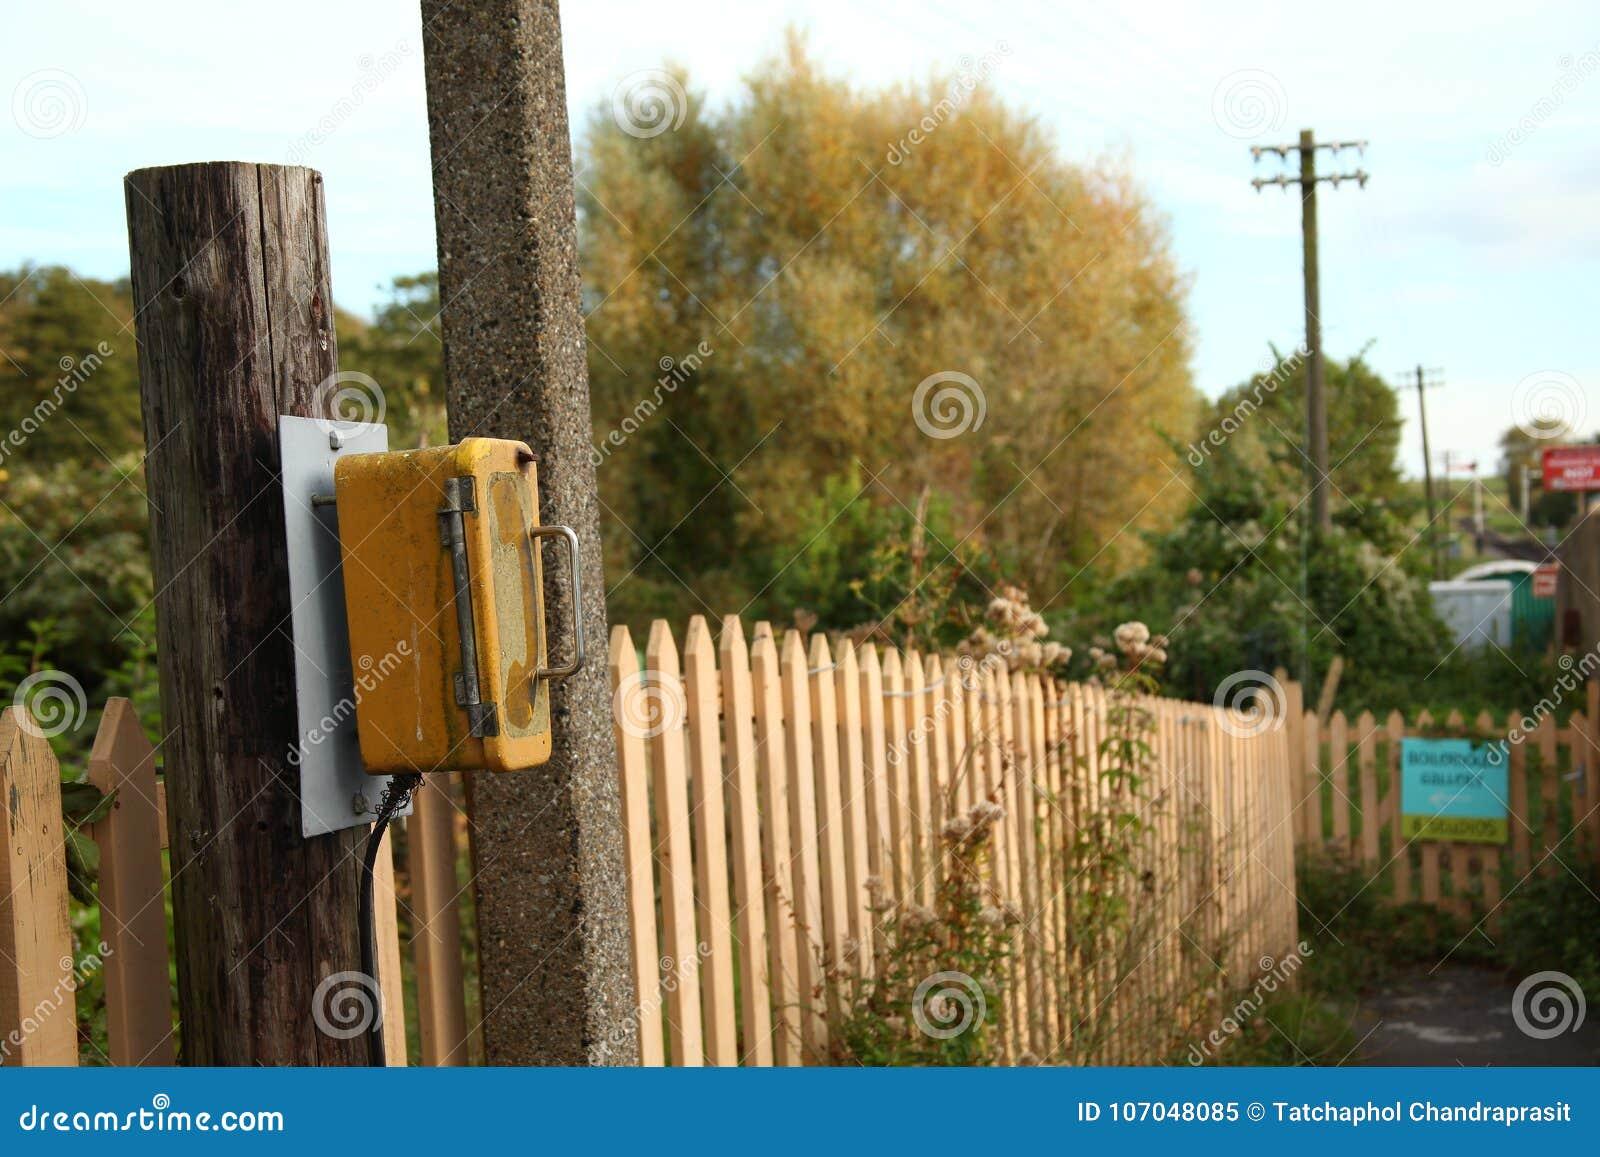 Telephone call box scene  stock image  Image of metal - 107048085